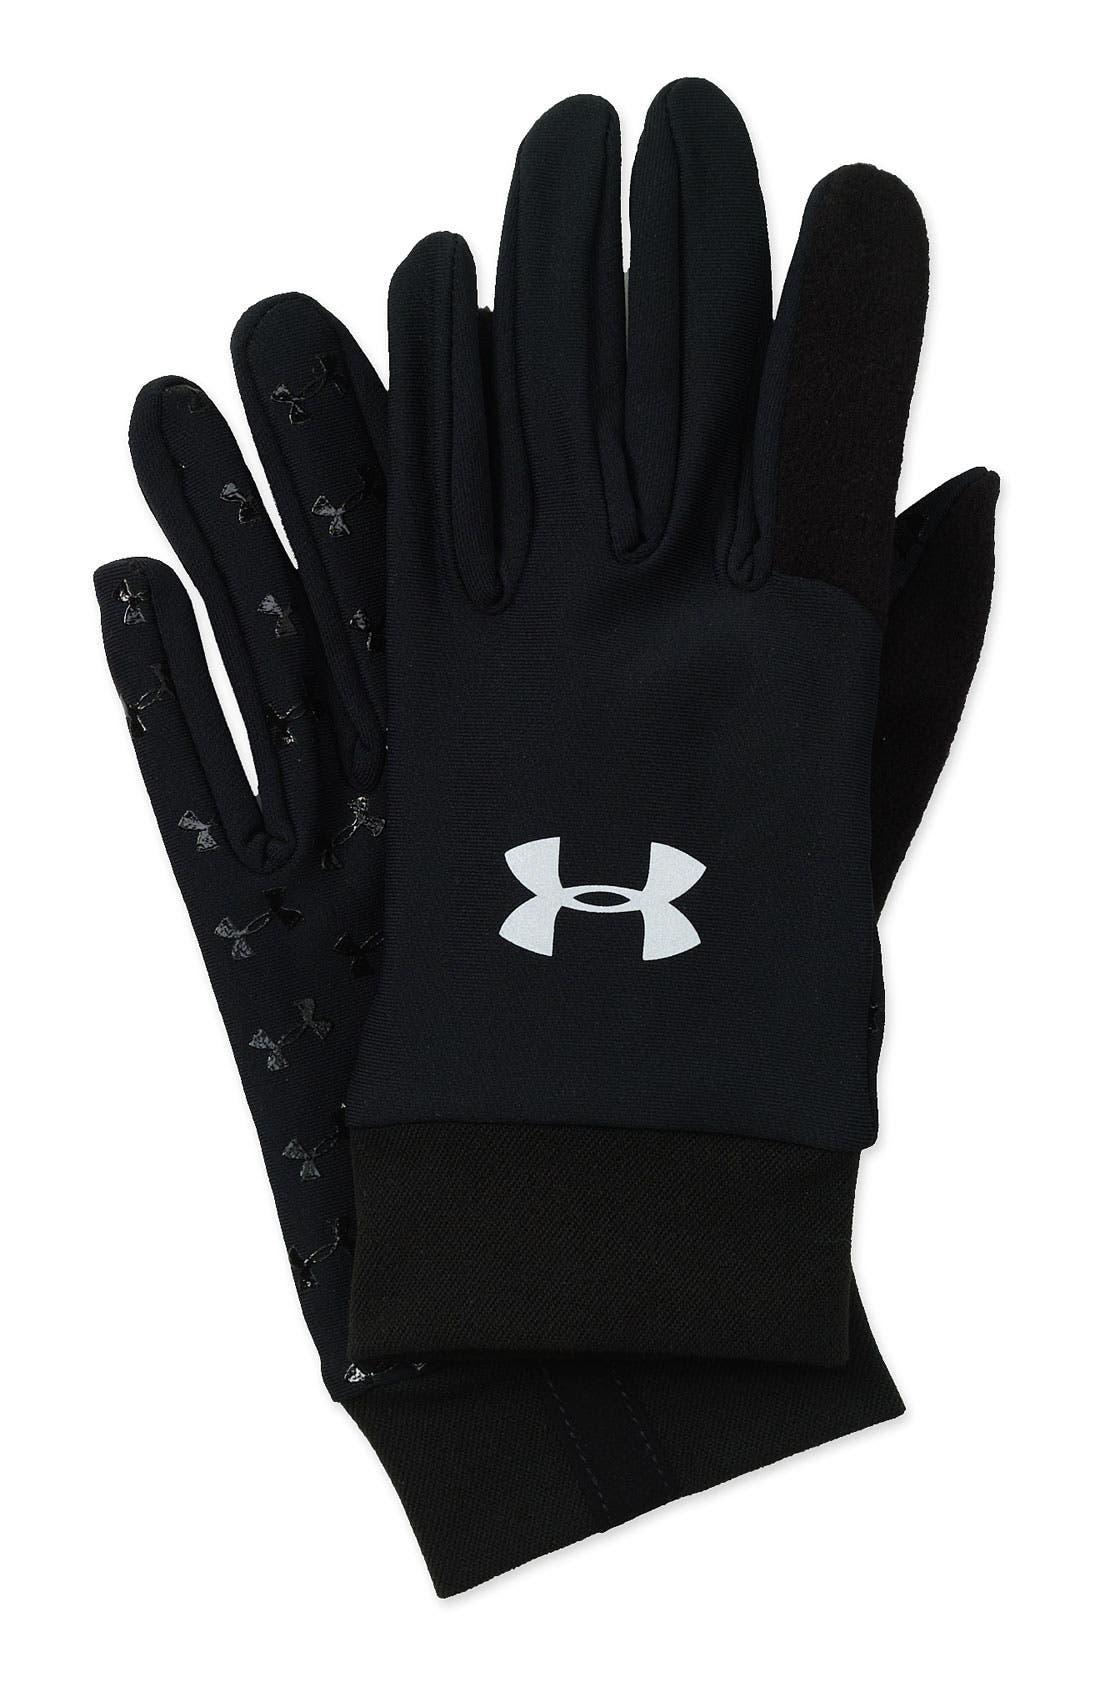 Main Image - Under Armour ColdGear® Liner Gloves